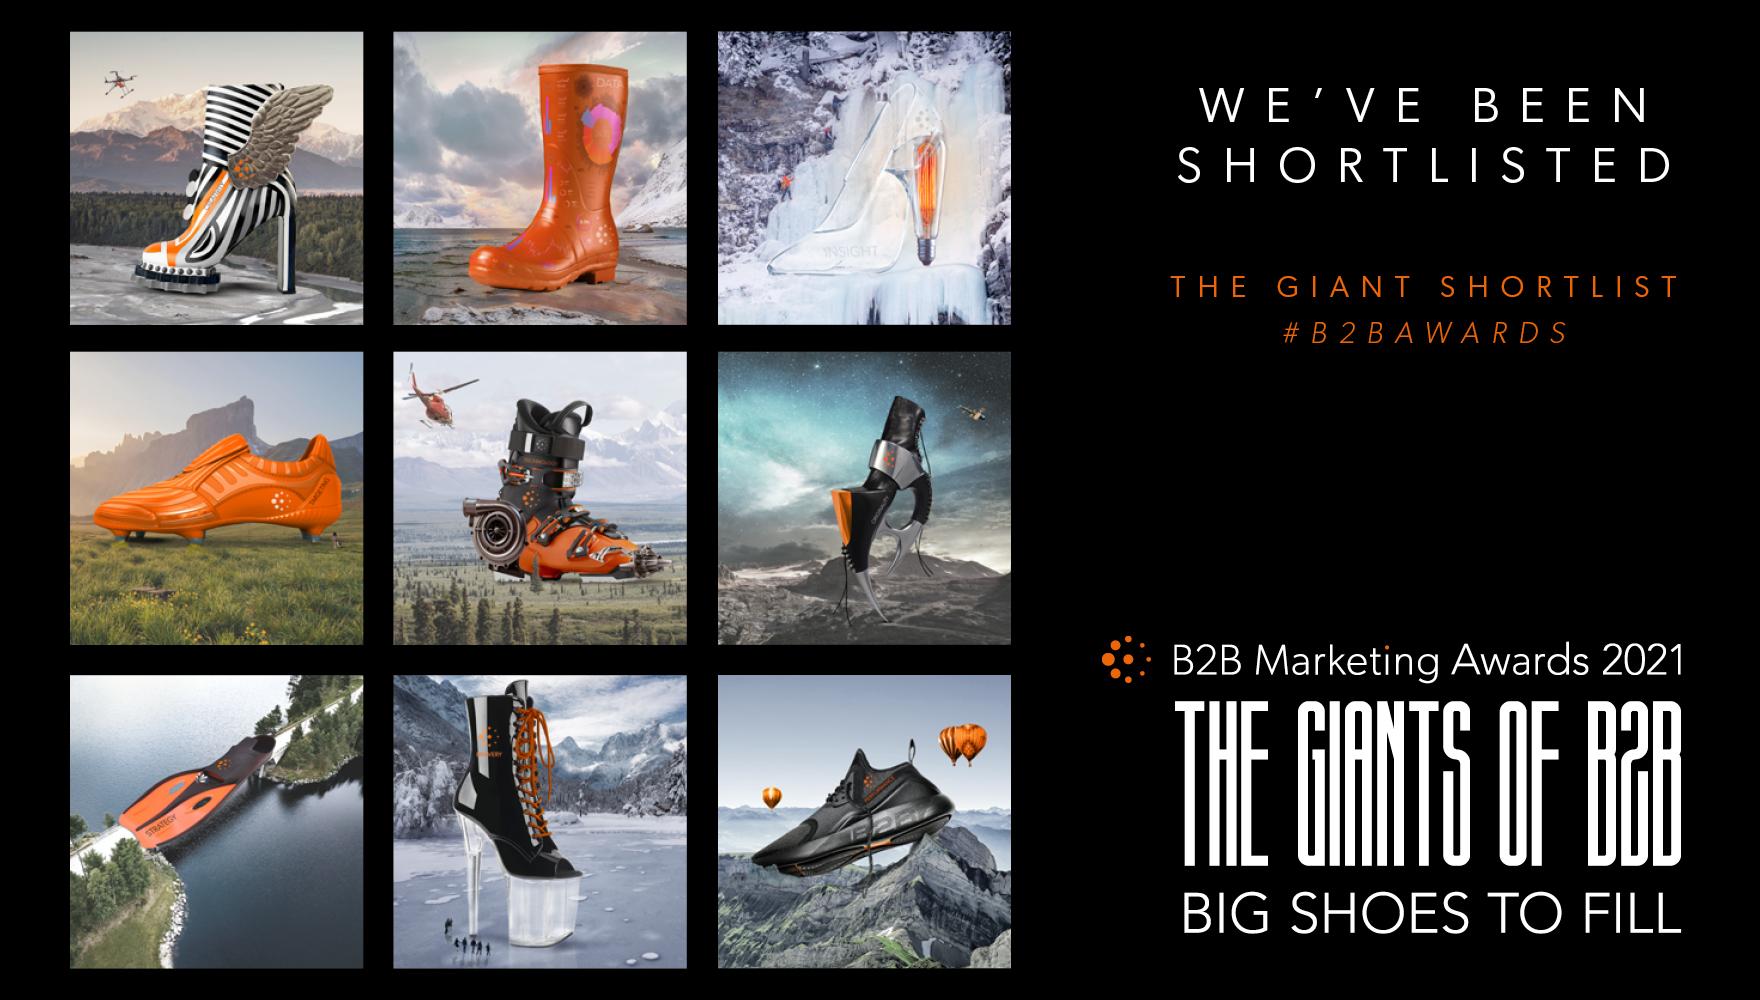 B2B Marketing Awards 2021 Shortlist